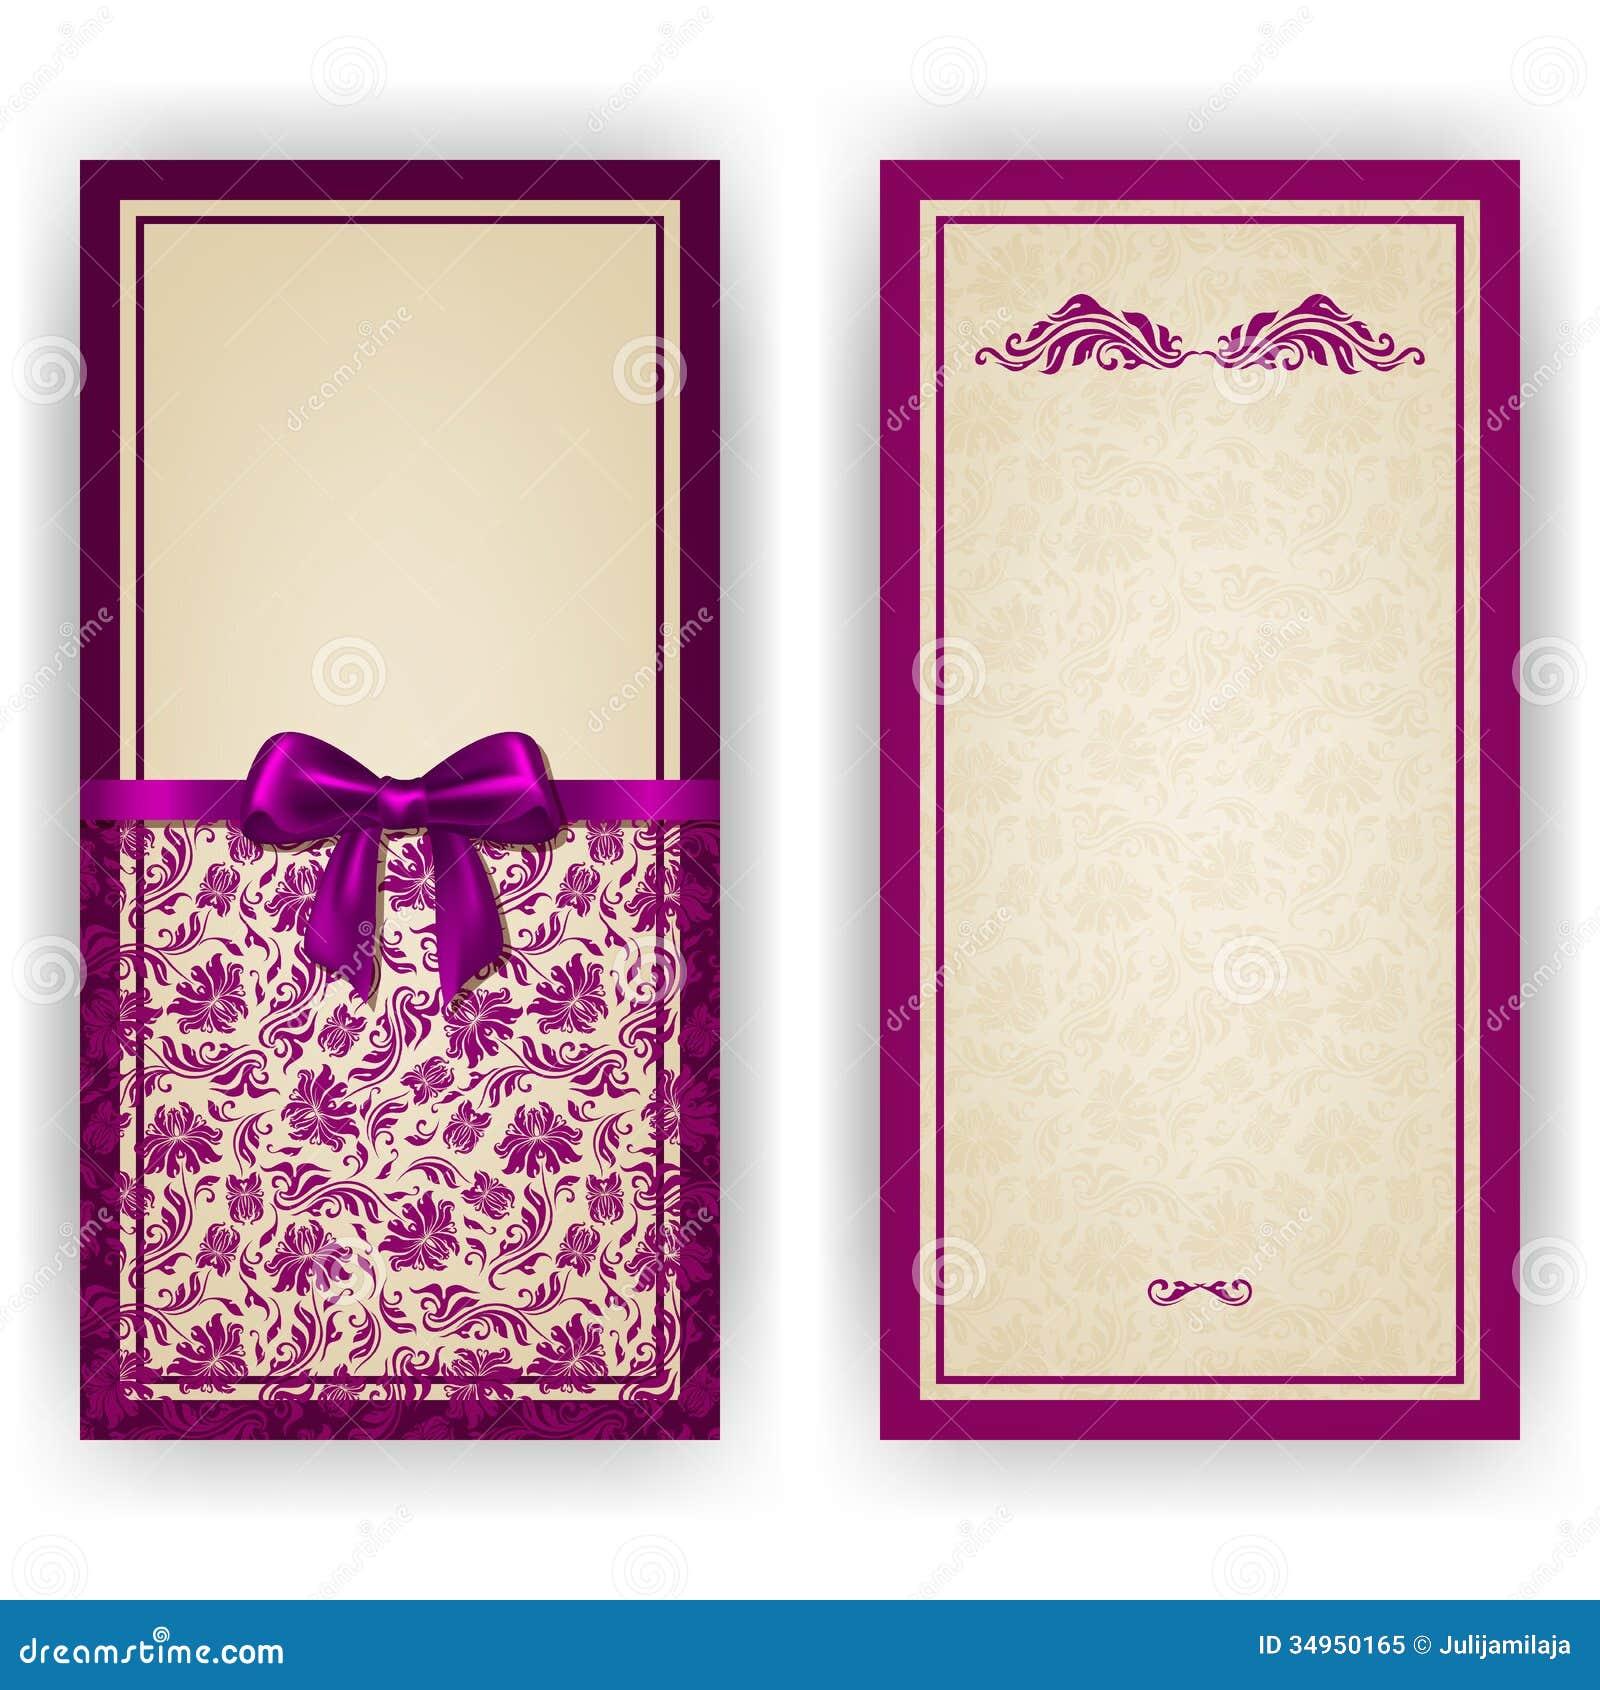 elegant vector template for luxury invitation royalty free stock